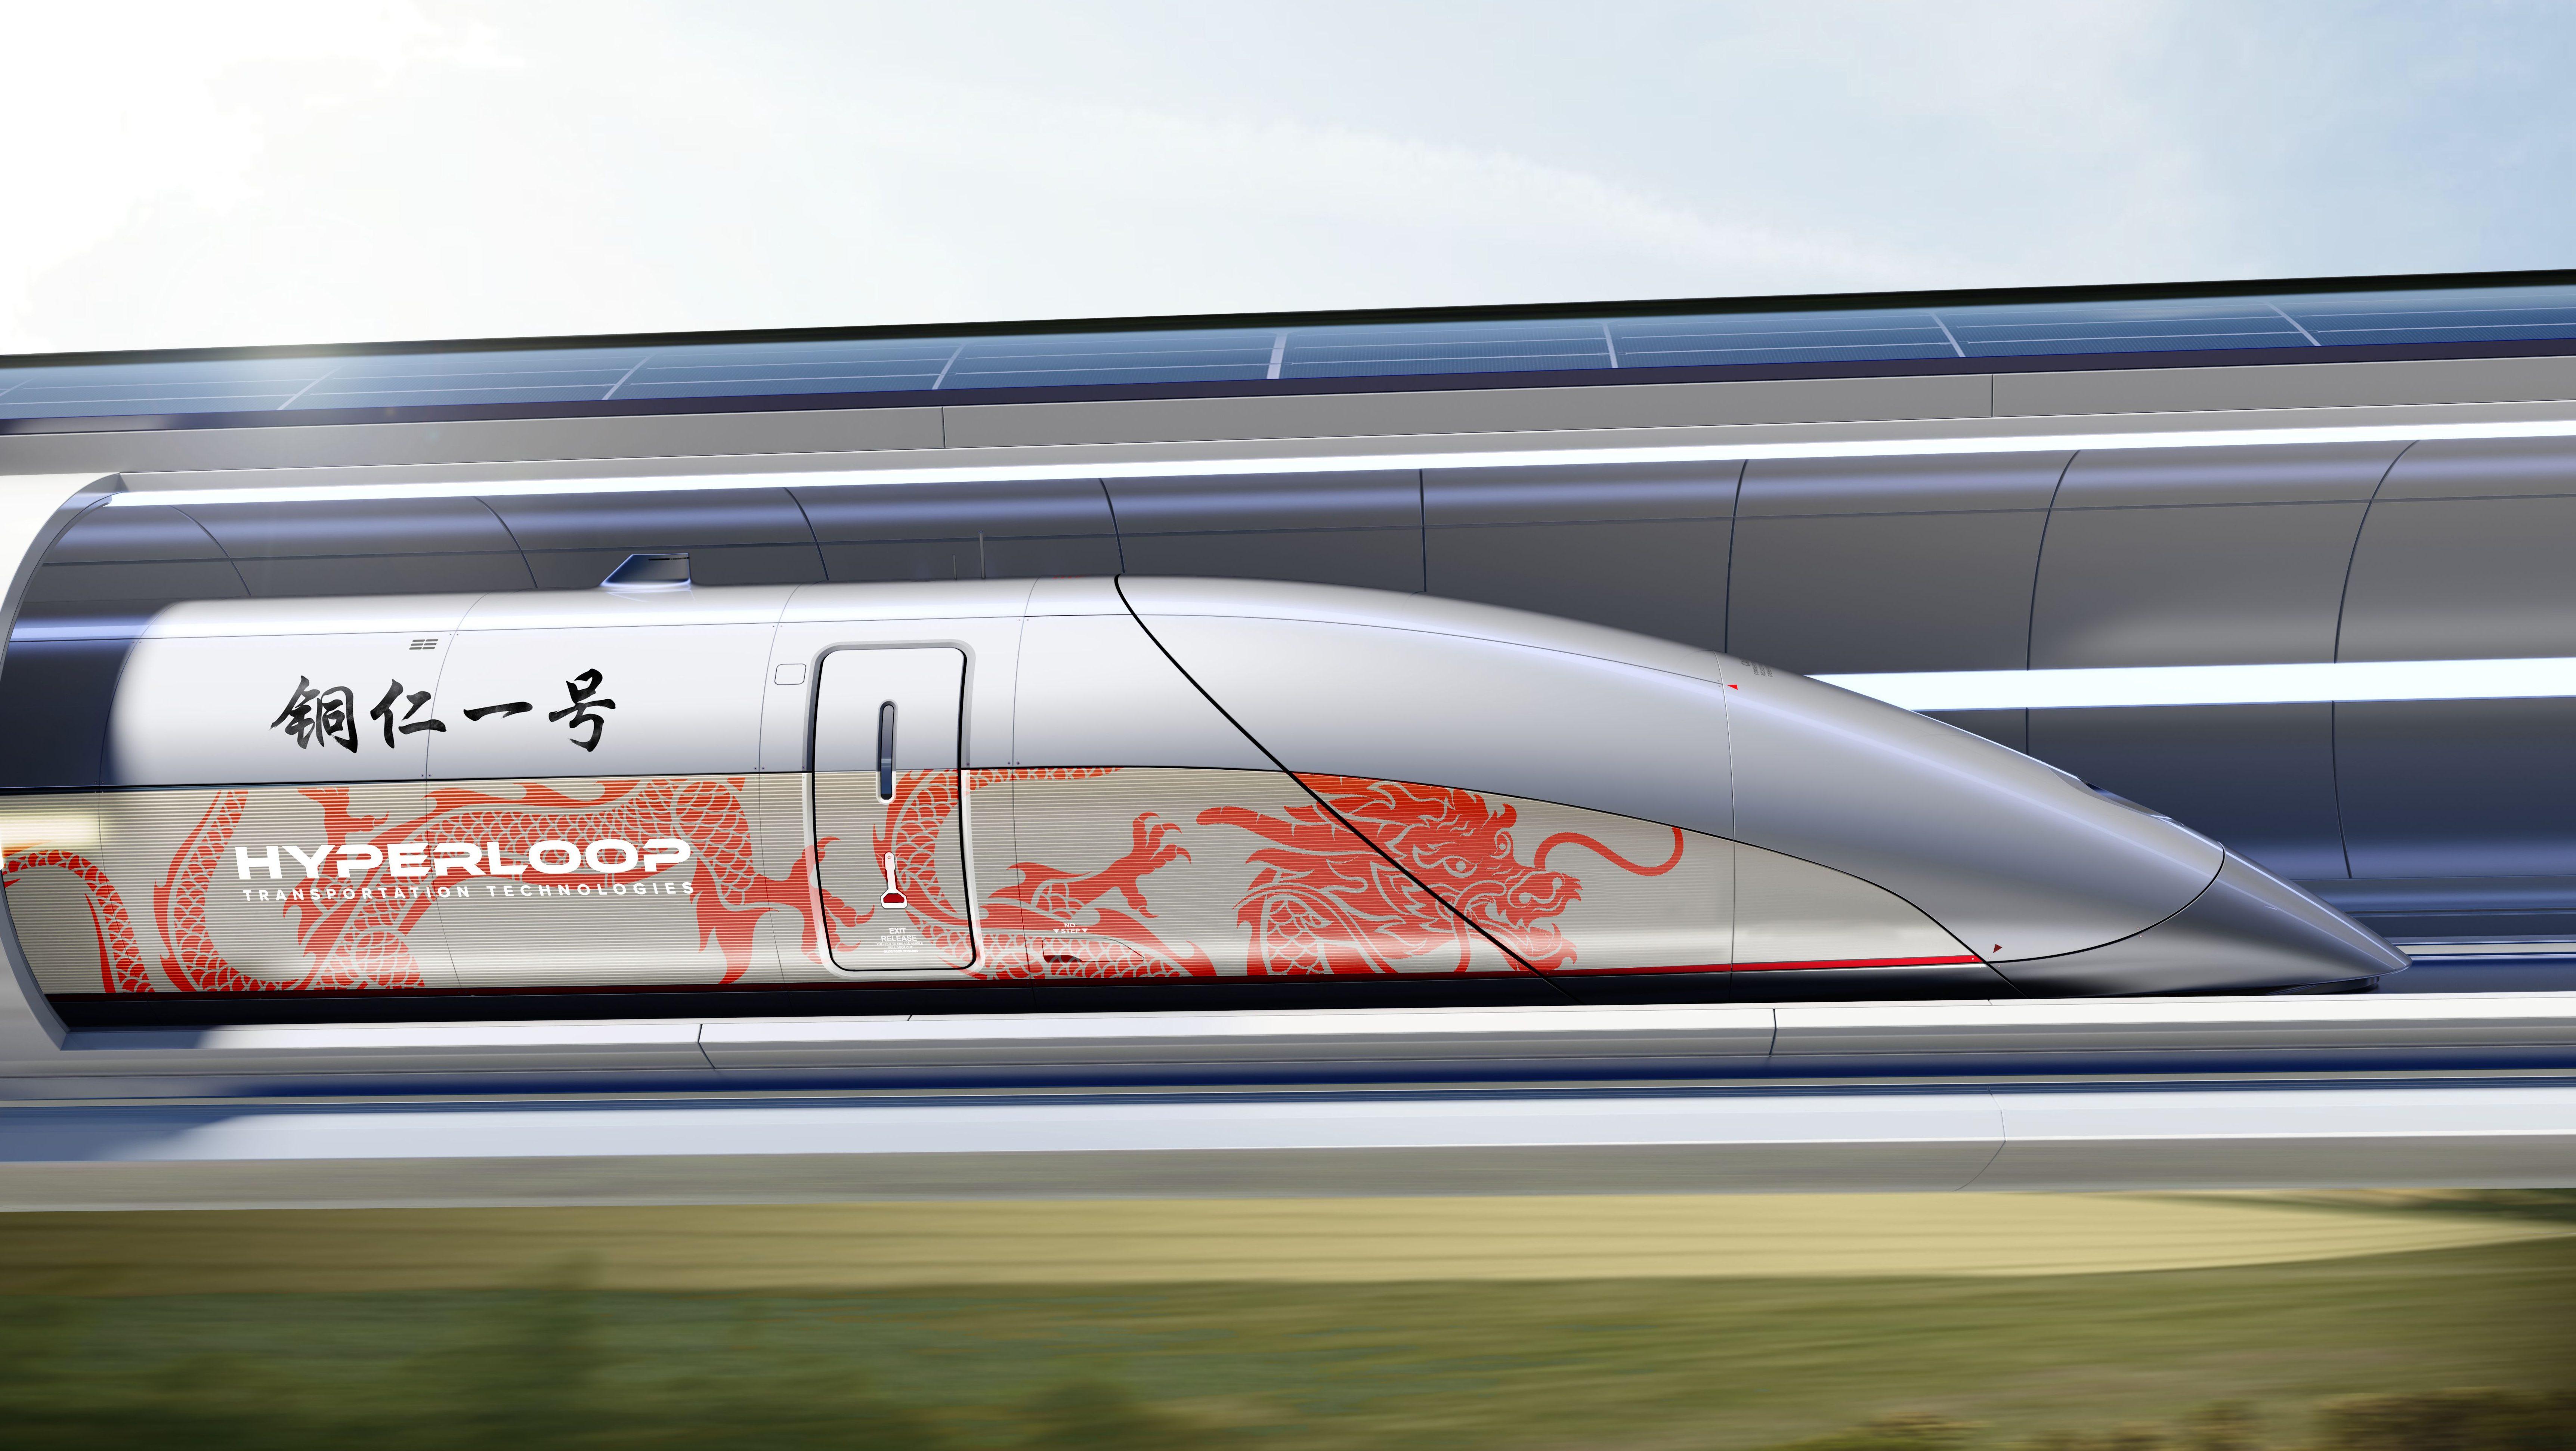 The hyperloop transportation system in Guizhou.